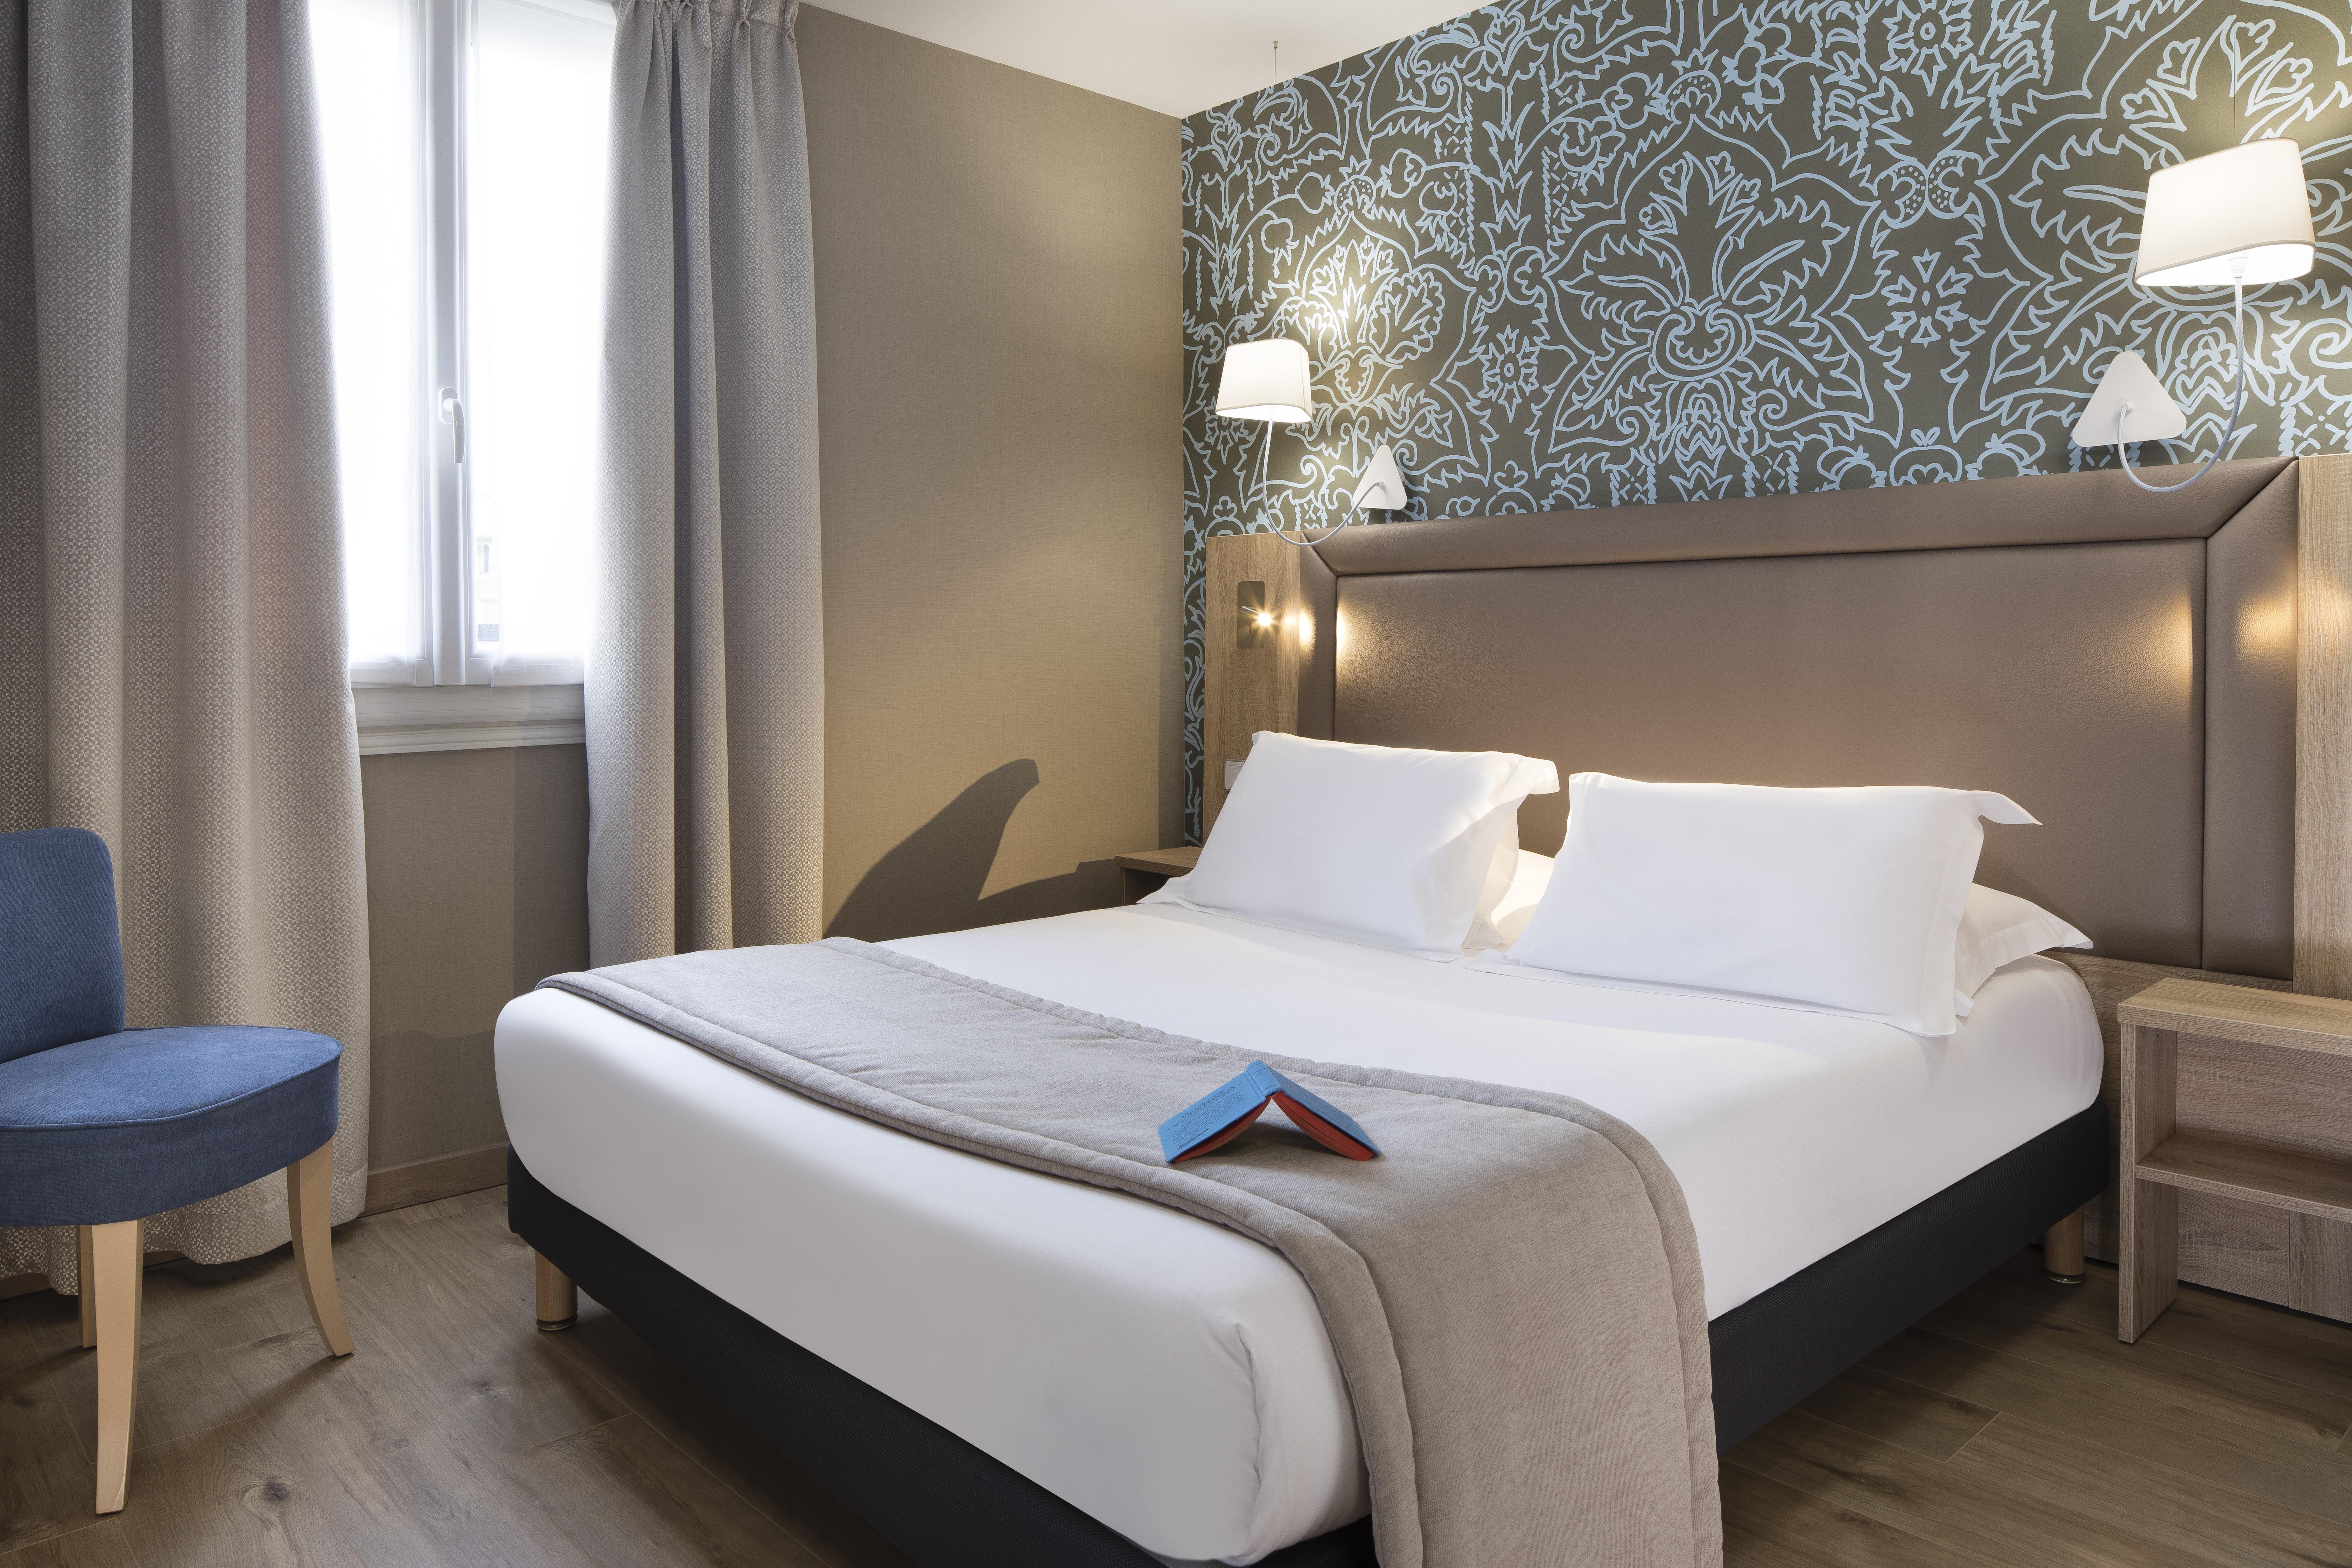 Chambre à l'Hôtel Daumesnil